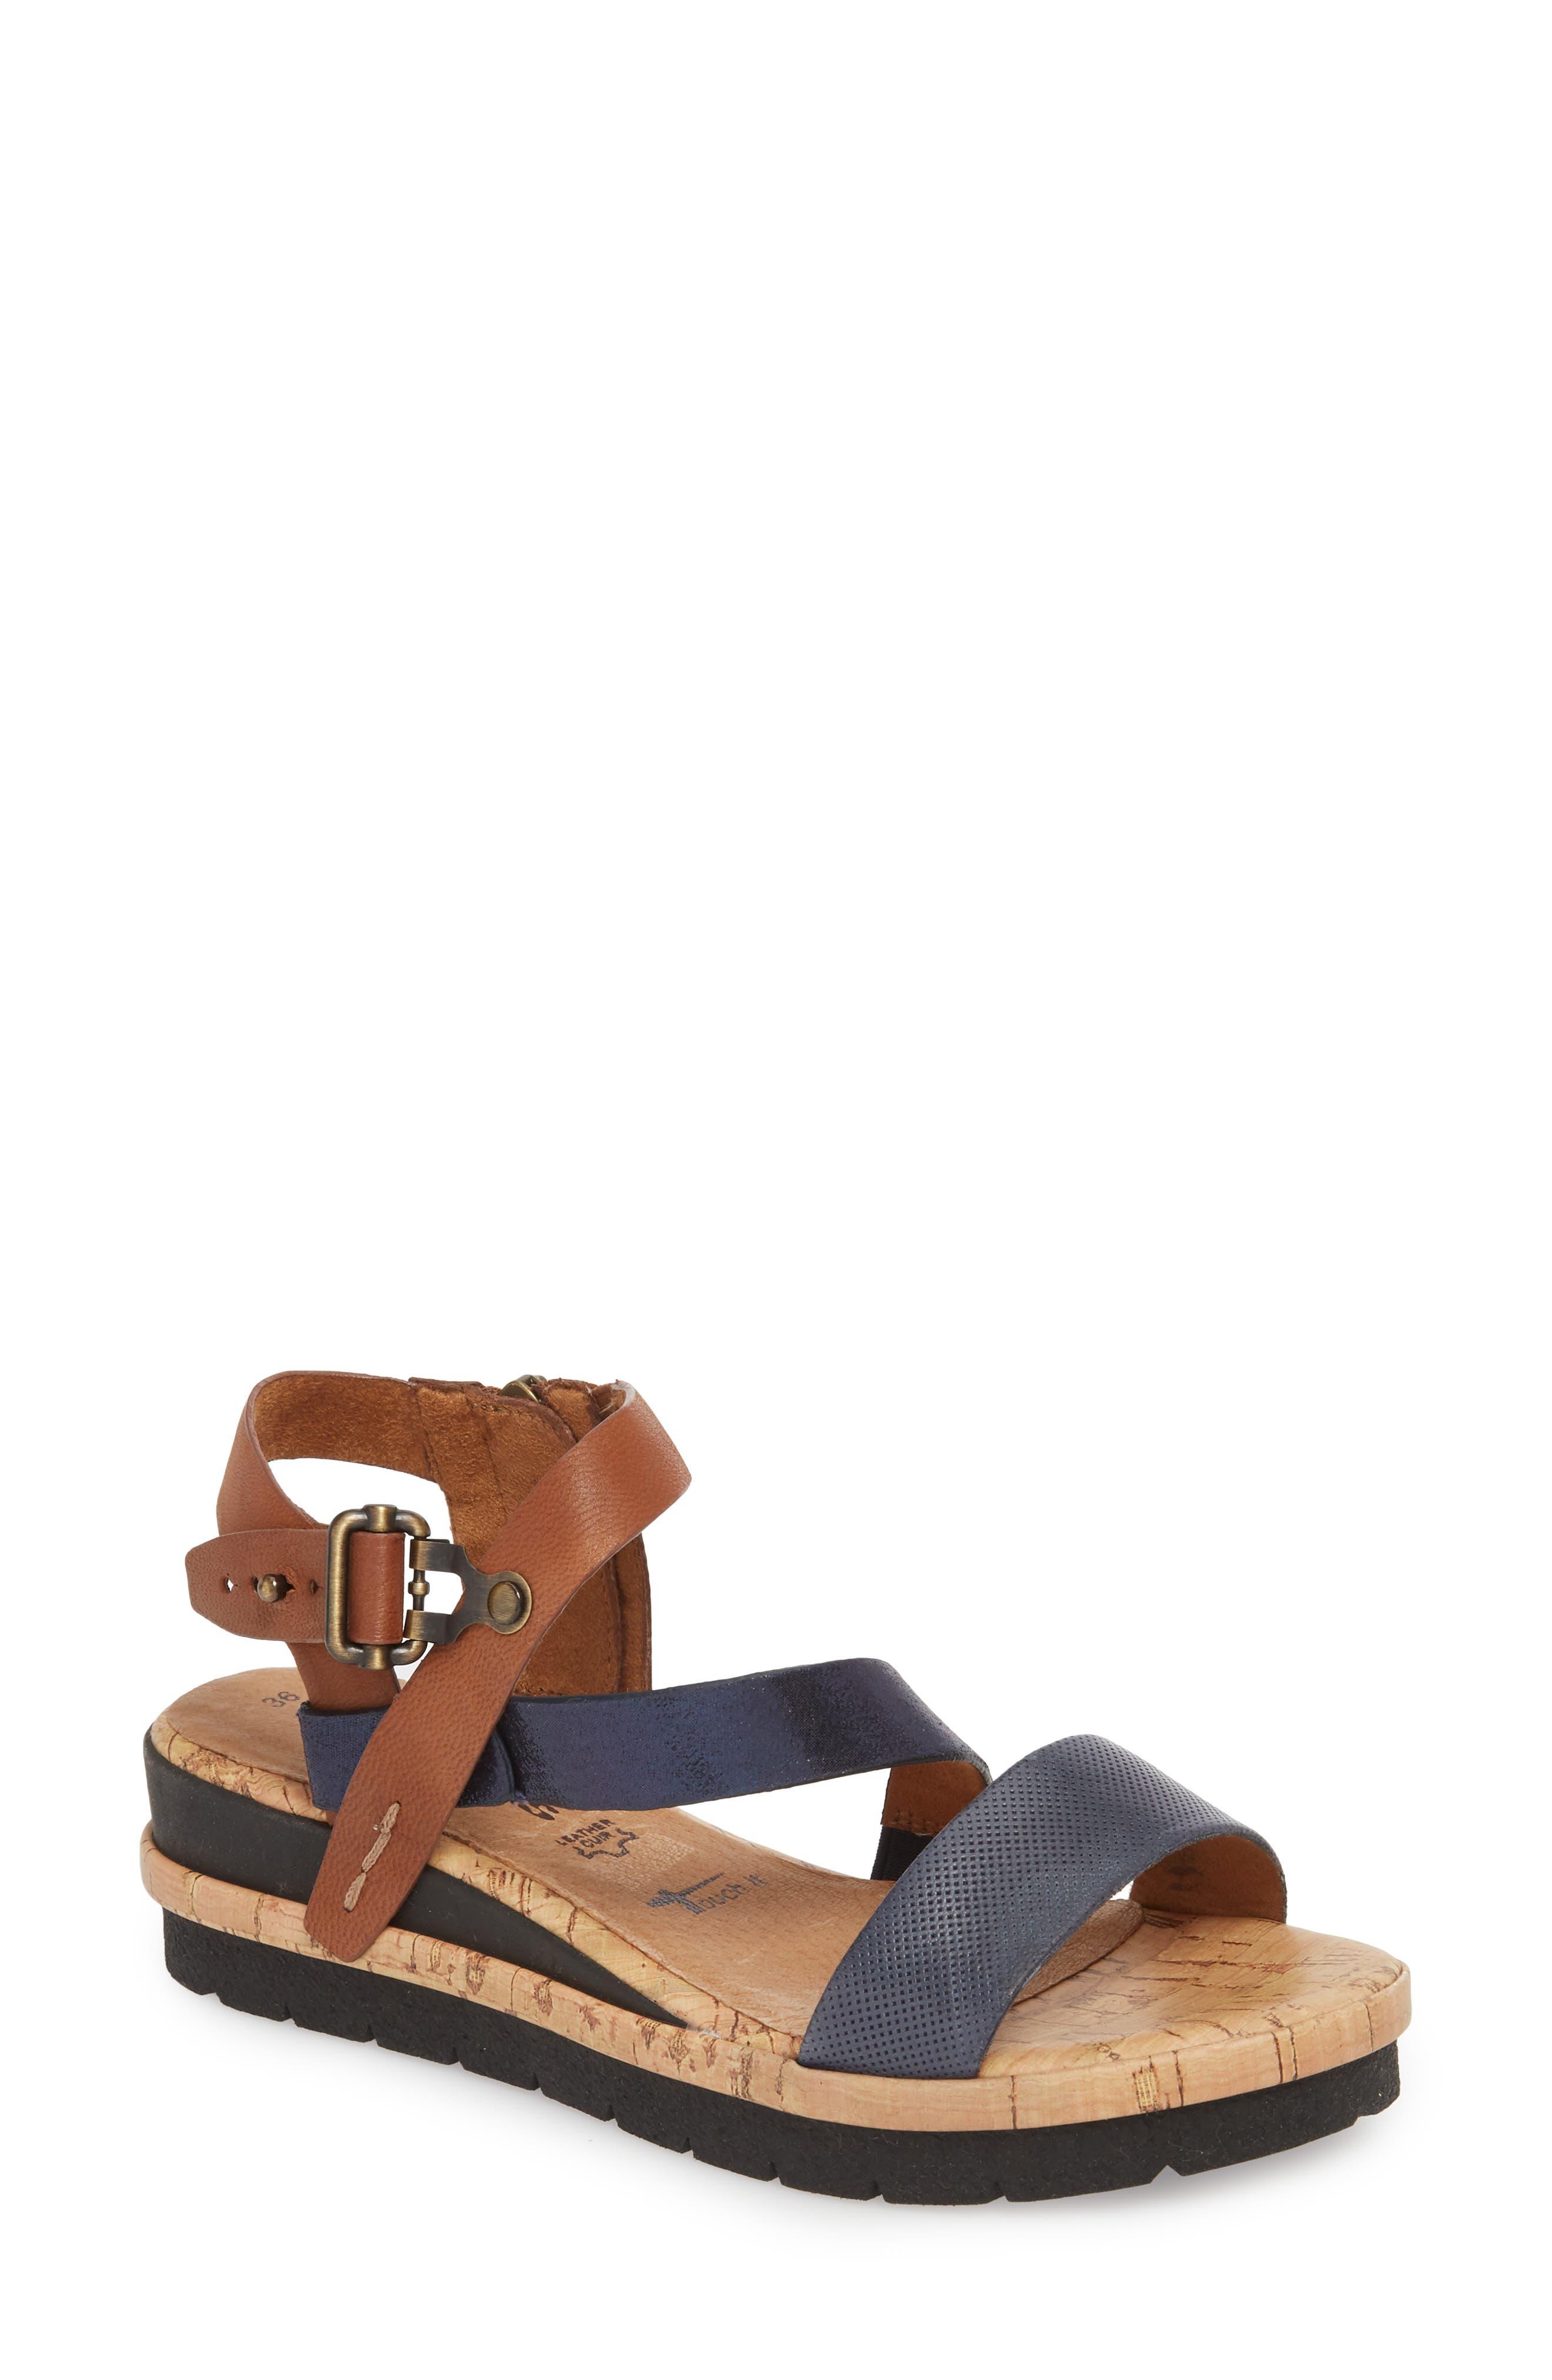 Eda Diagonal Strap Wedge Sandal,                         Main,                         color, Navy/ Cognac Leather